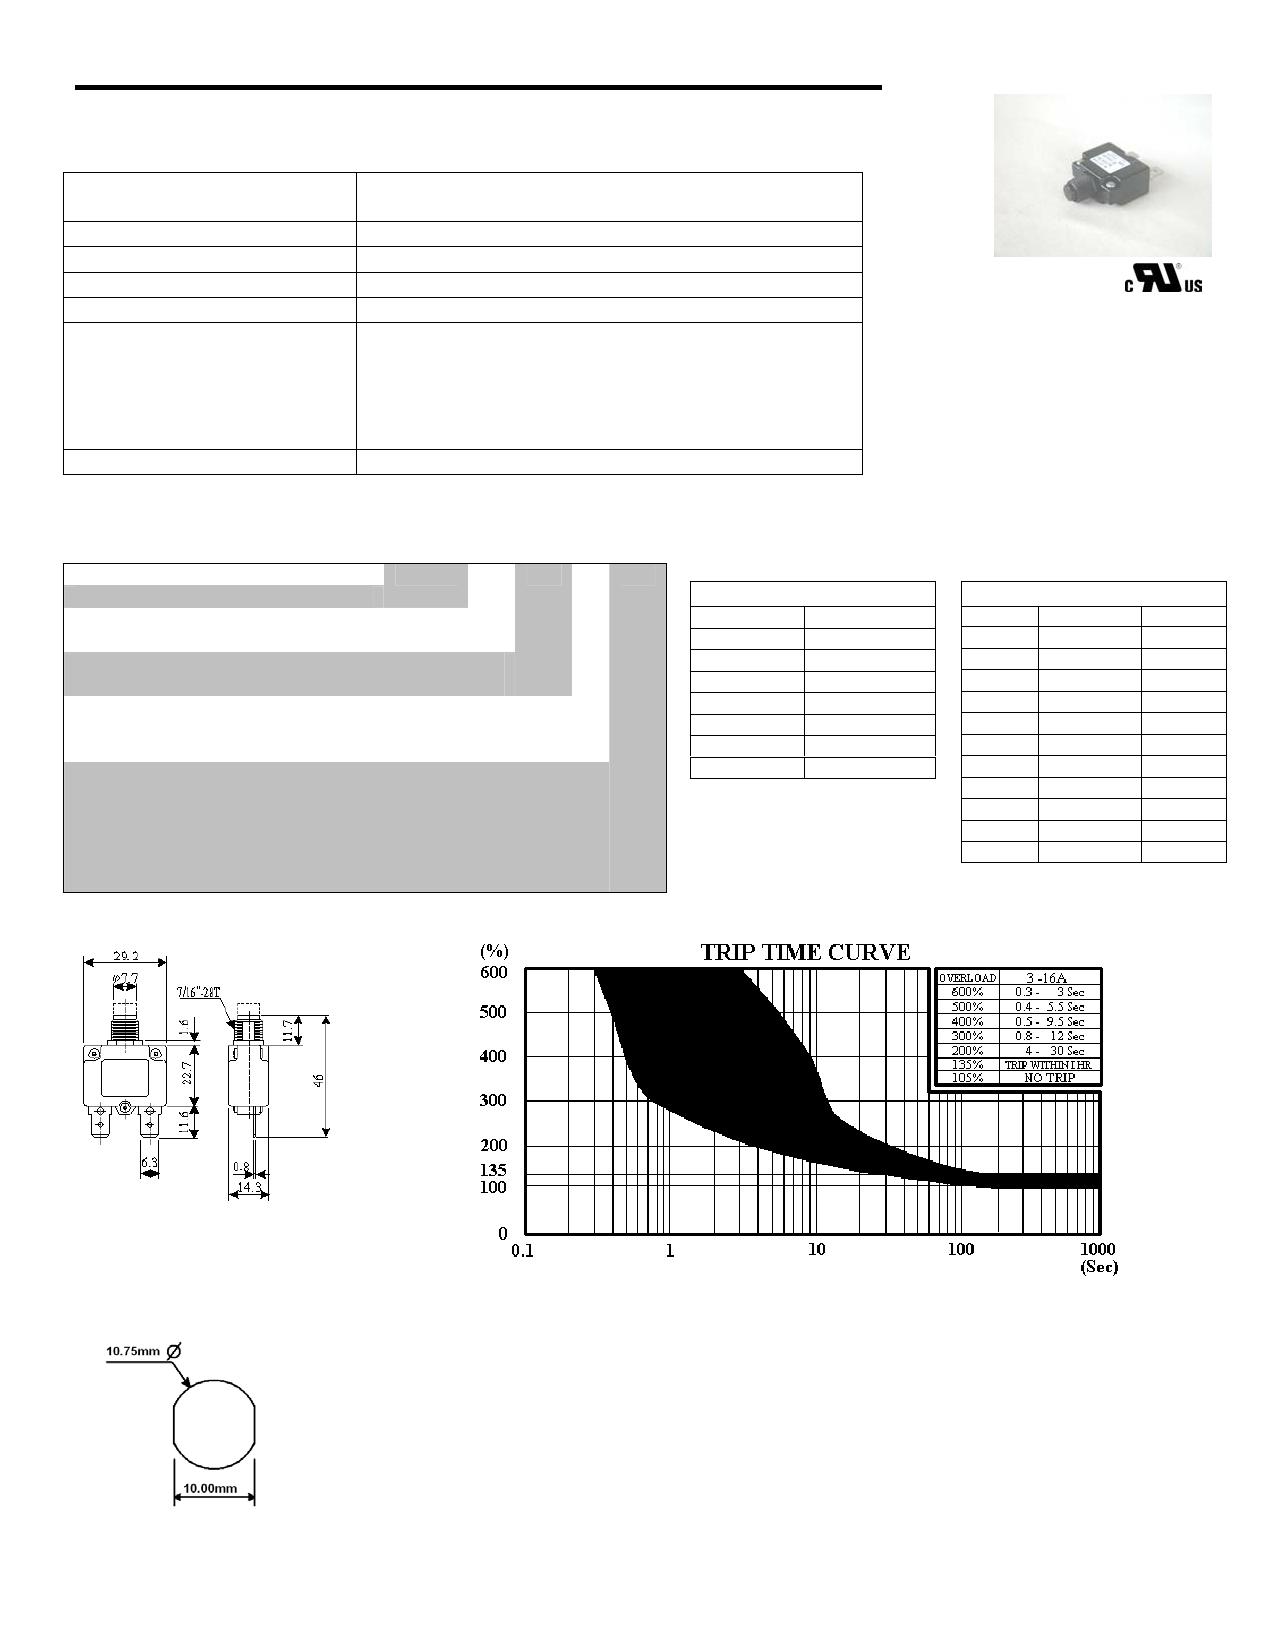 A-0709P7.1ABF 데이터시트 및 A-0709P7.1ABF PDF